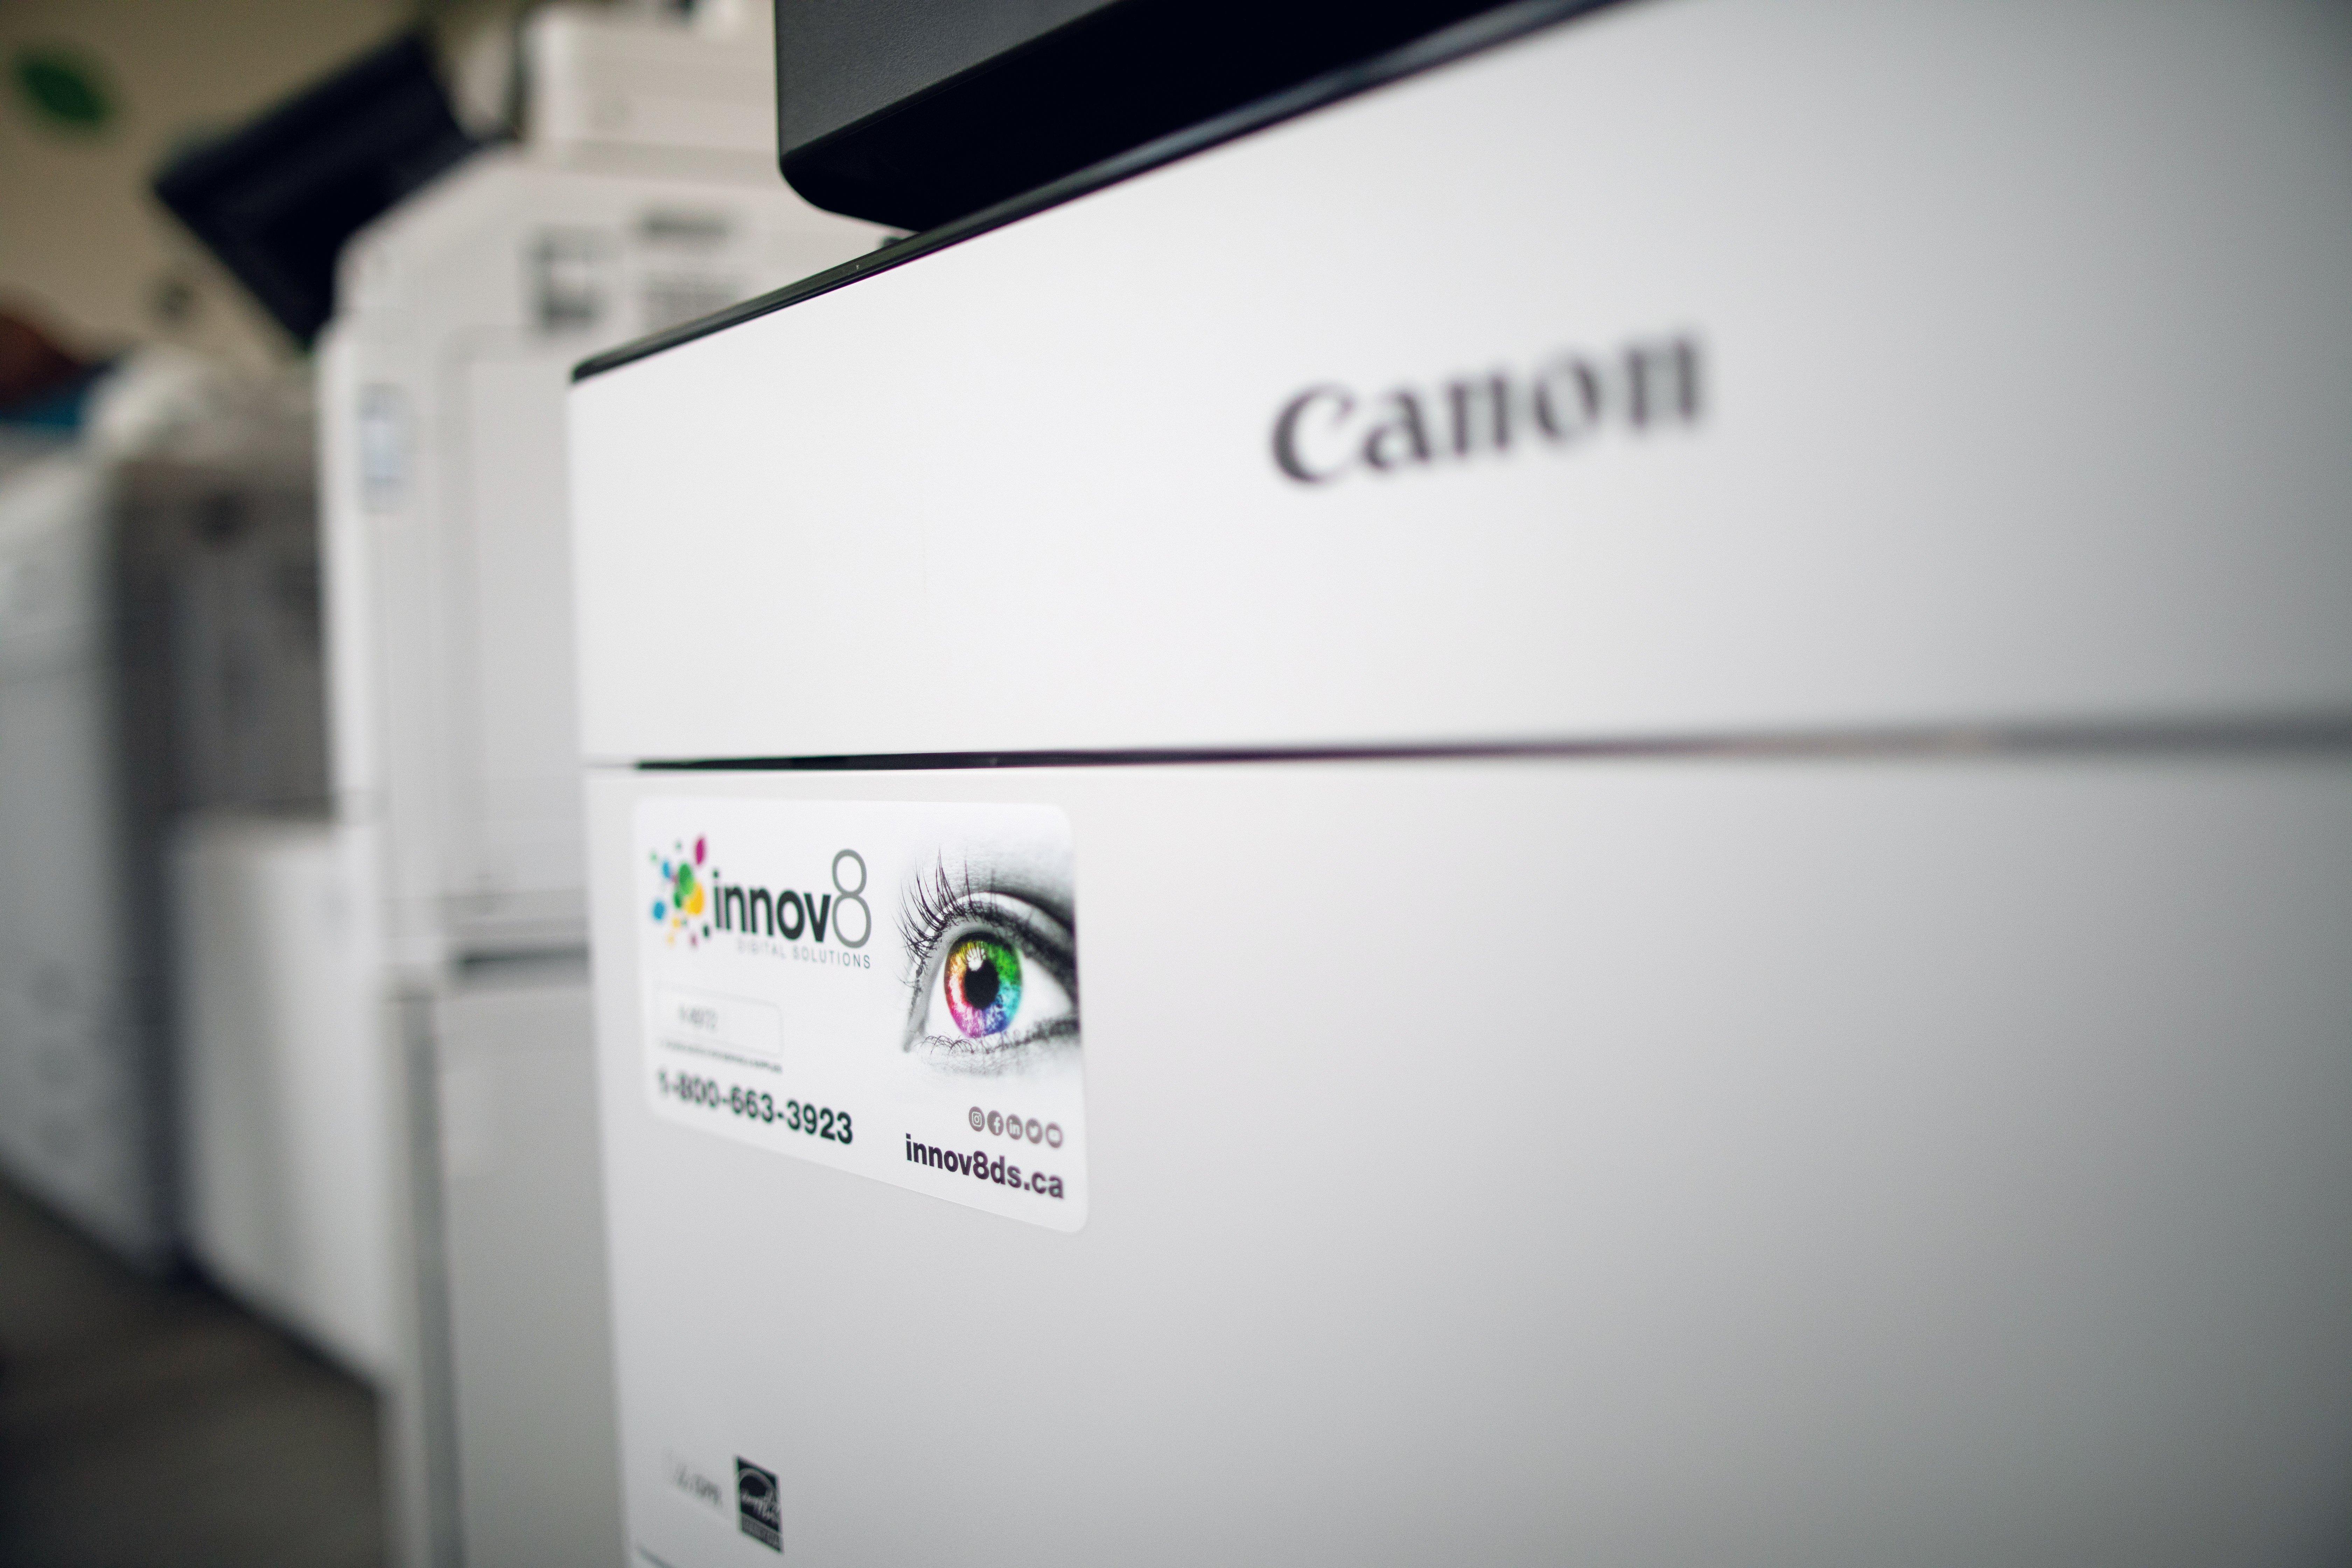 canon-multifunction-printer-innov8